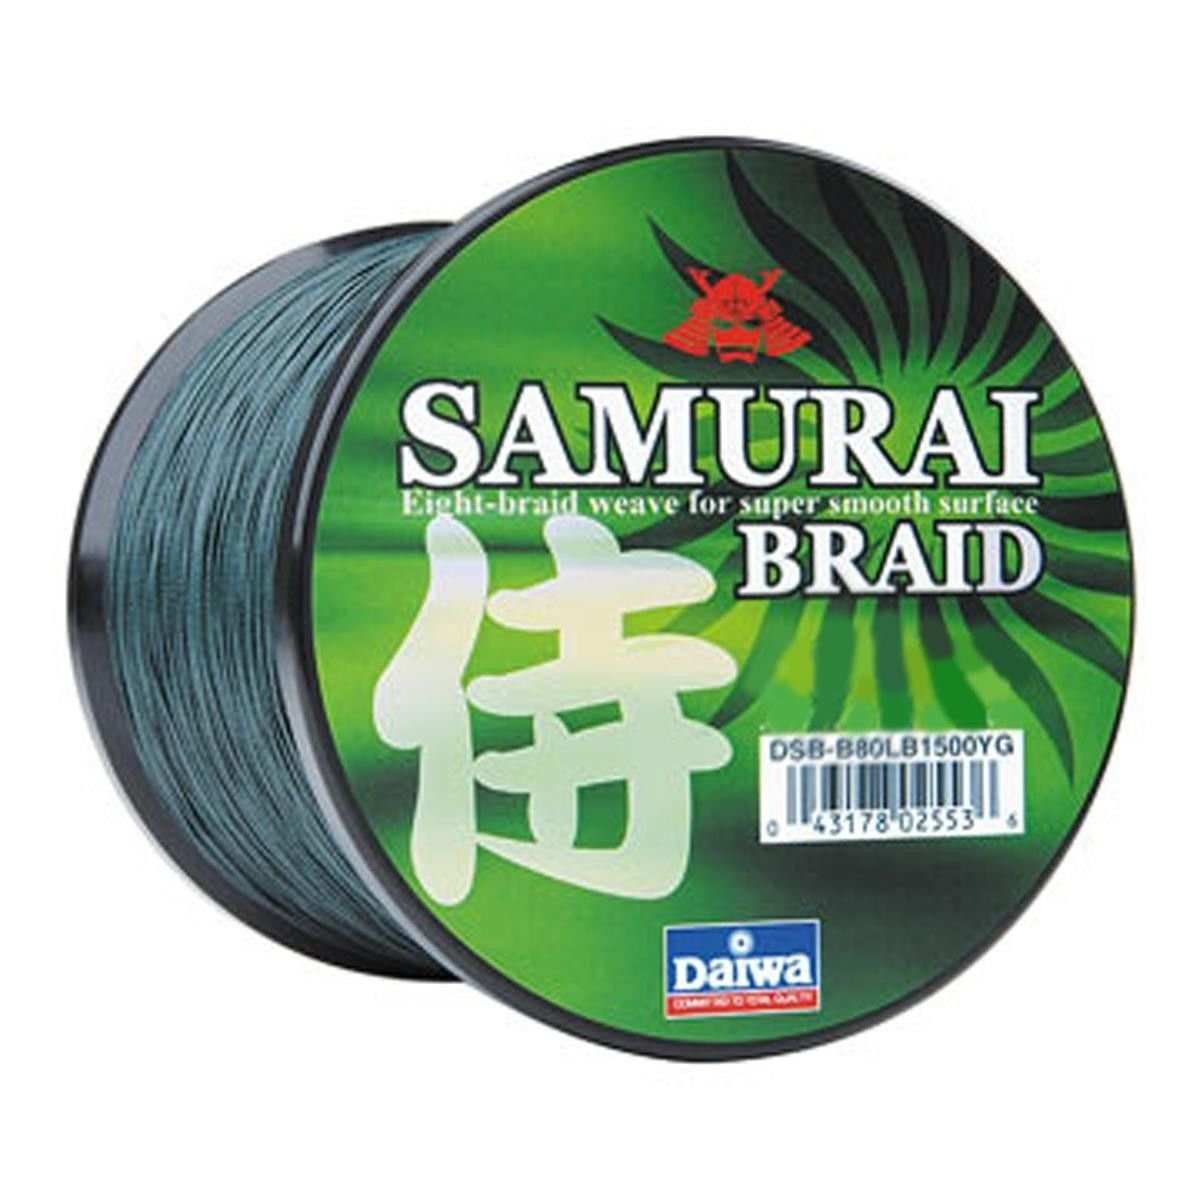 Daiwa DSB-B30LB150YG Samurai Braid